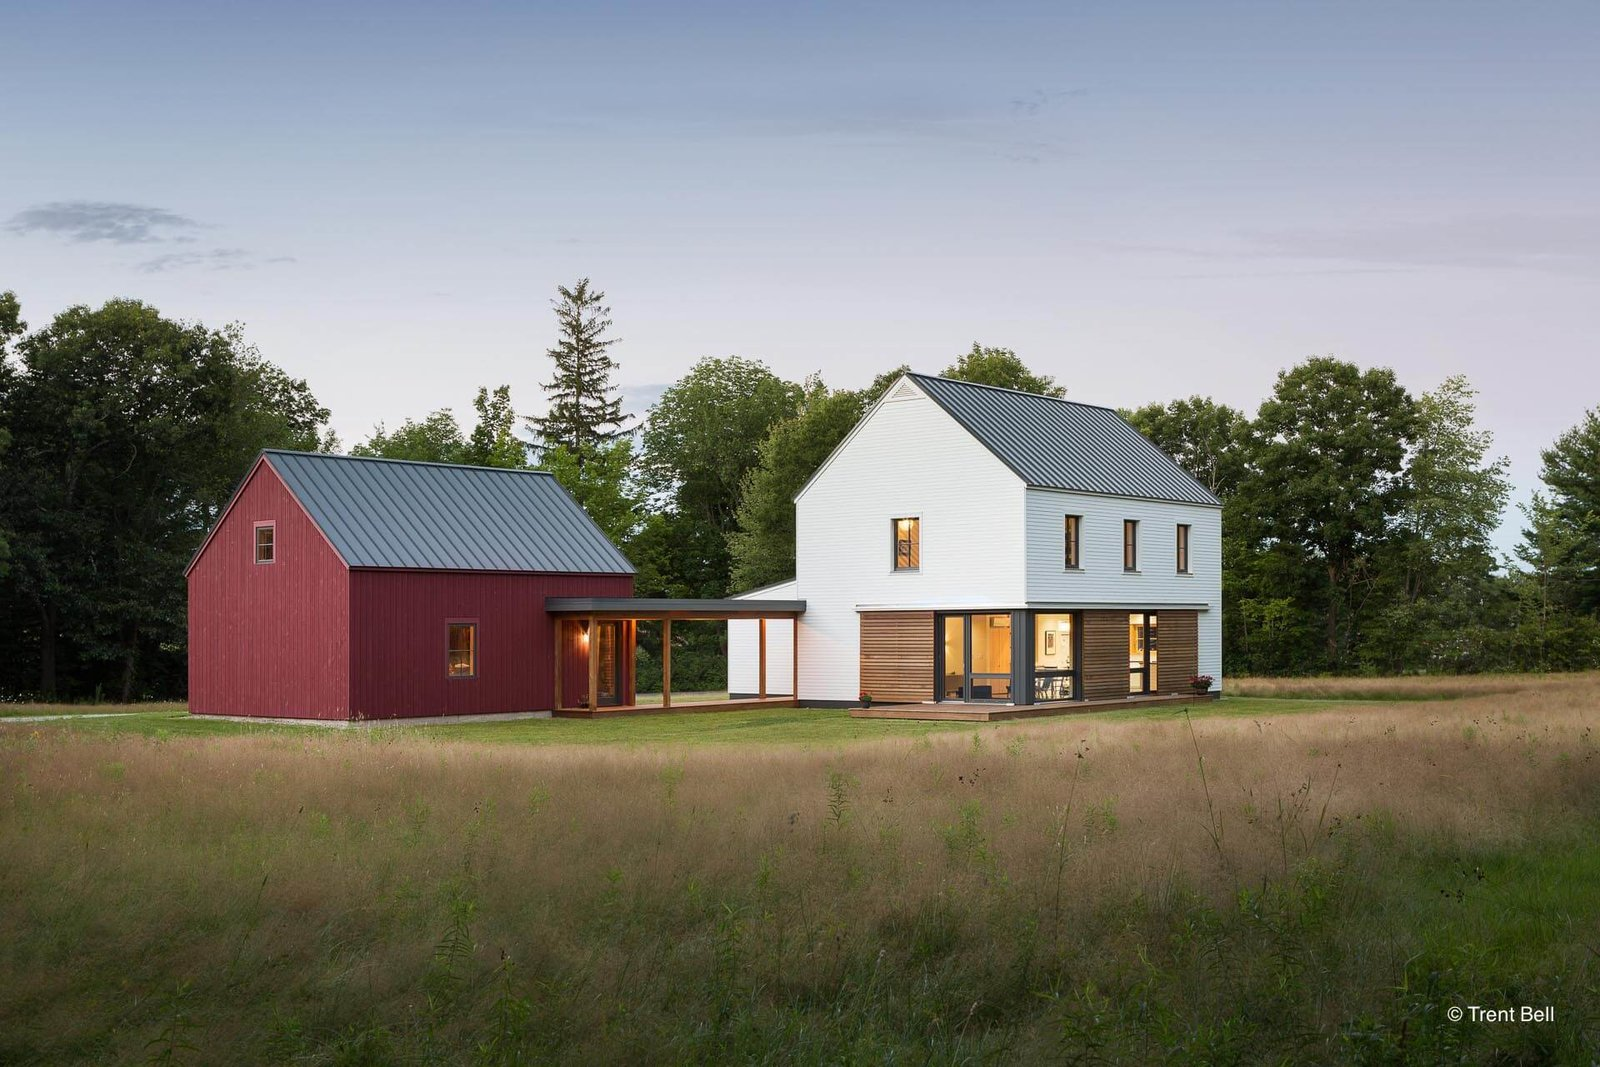 5 maine prefab companies paving the way for modular design - Contemporary modular home designs ...